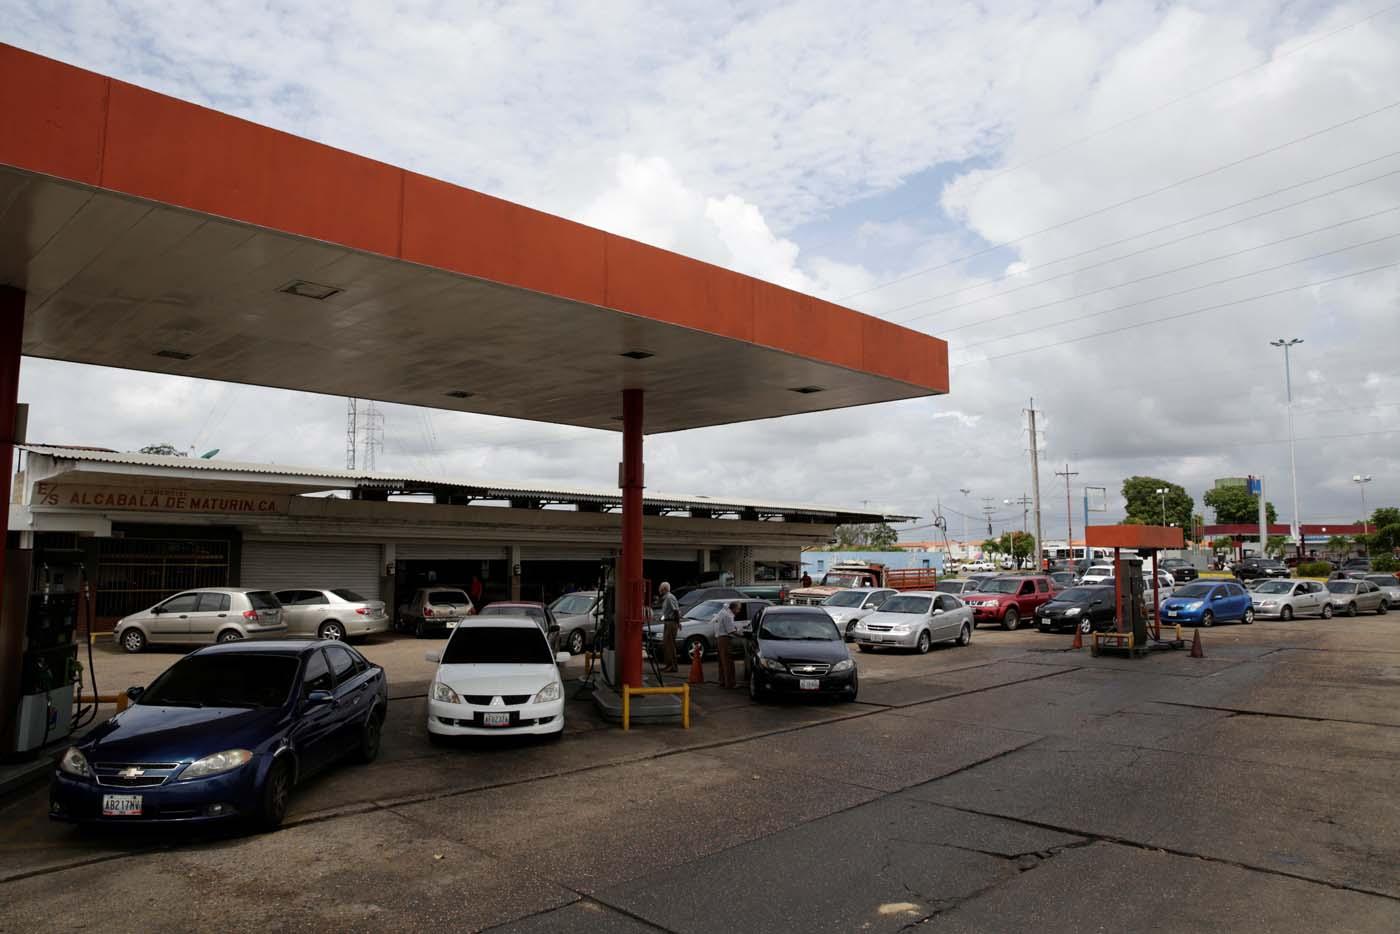 Venezuelan motorists line up for fuel at a gas station of Venezuelan state oil company PDVSA in Maturin, Venezuela March 23, 2017. REUTERS/Marco Bello